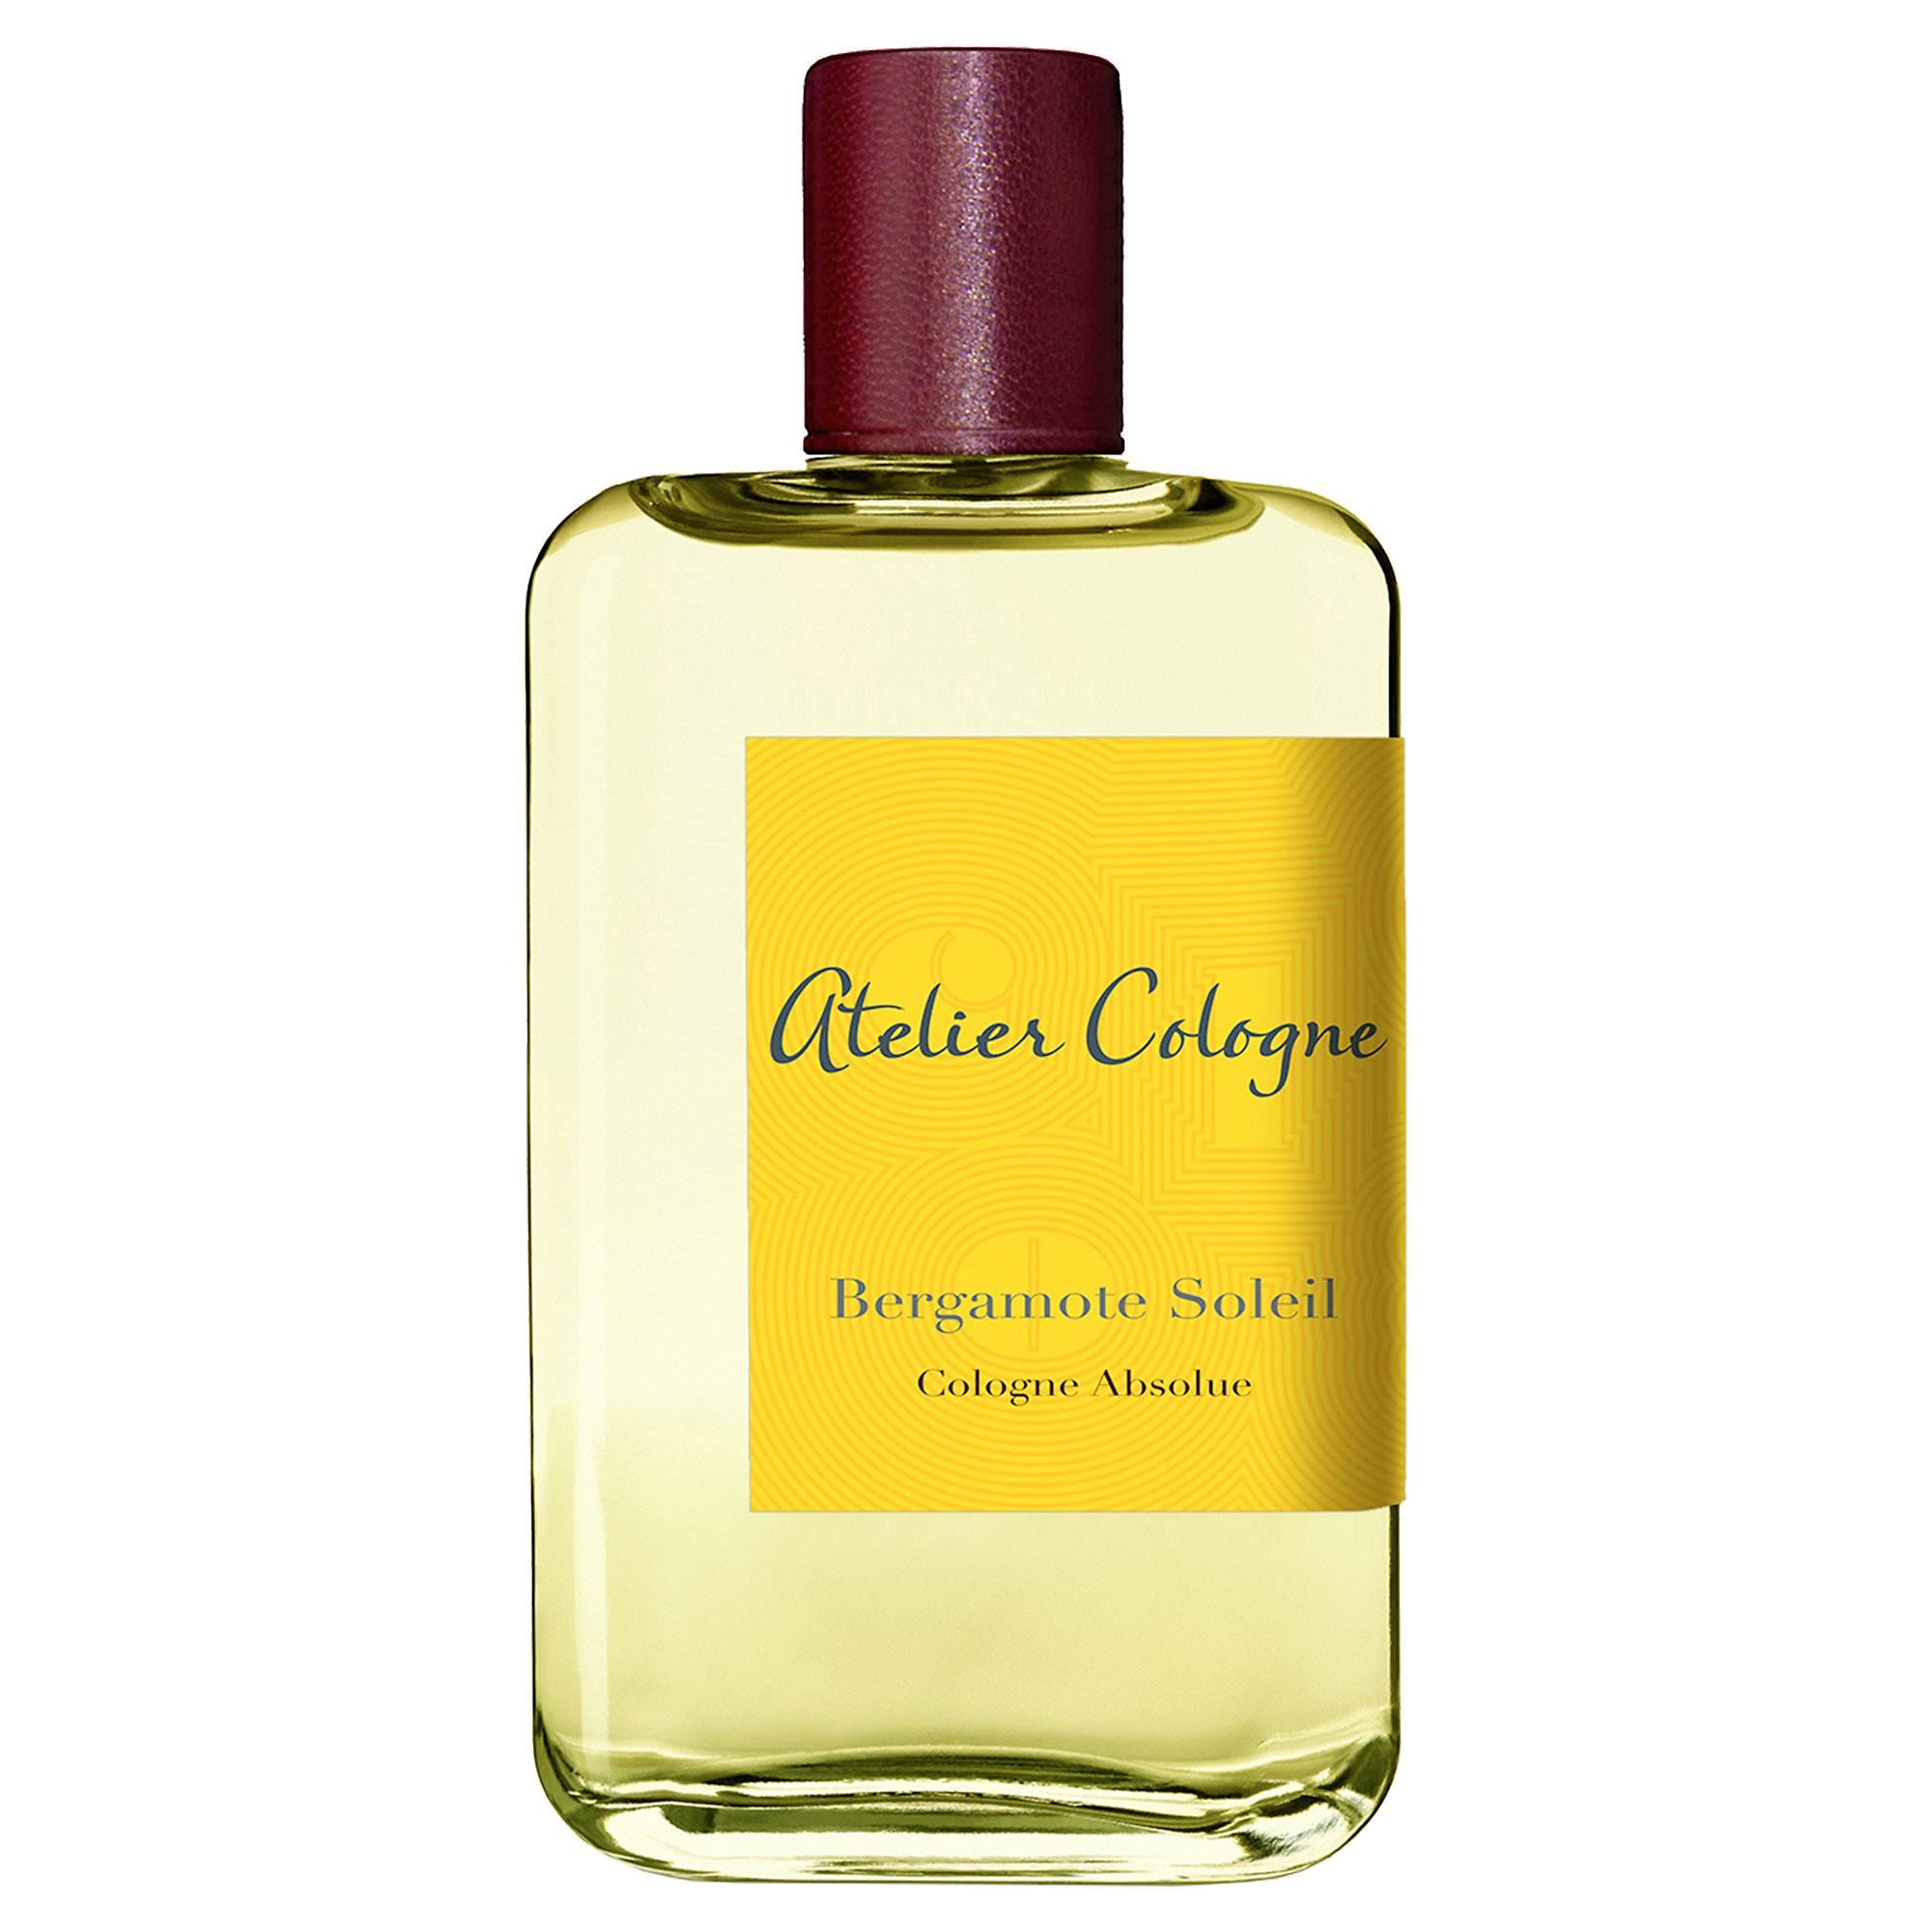 Atelier Cologne Bergamote Soleil аромат для мужчин и женщин